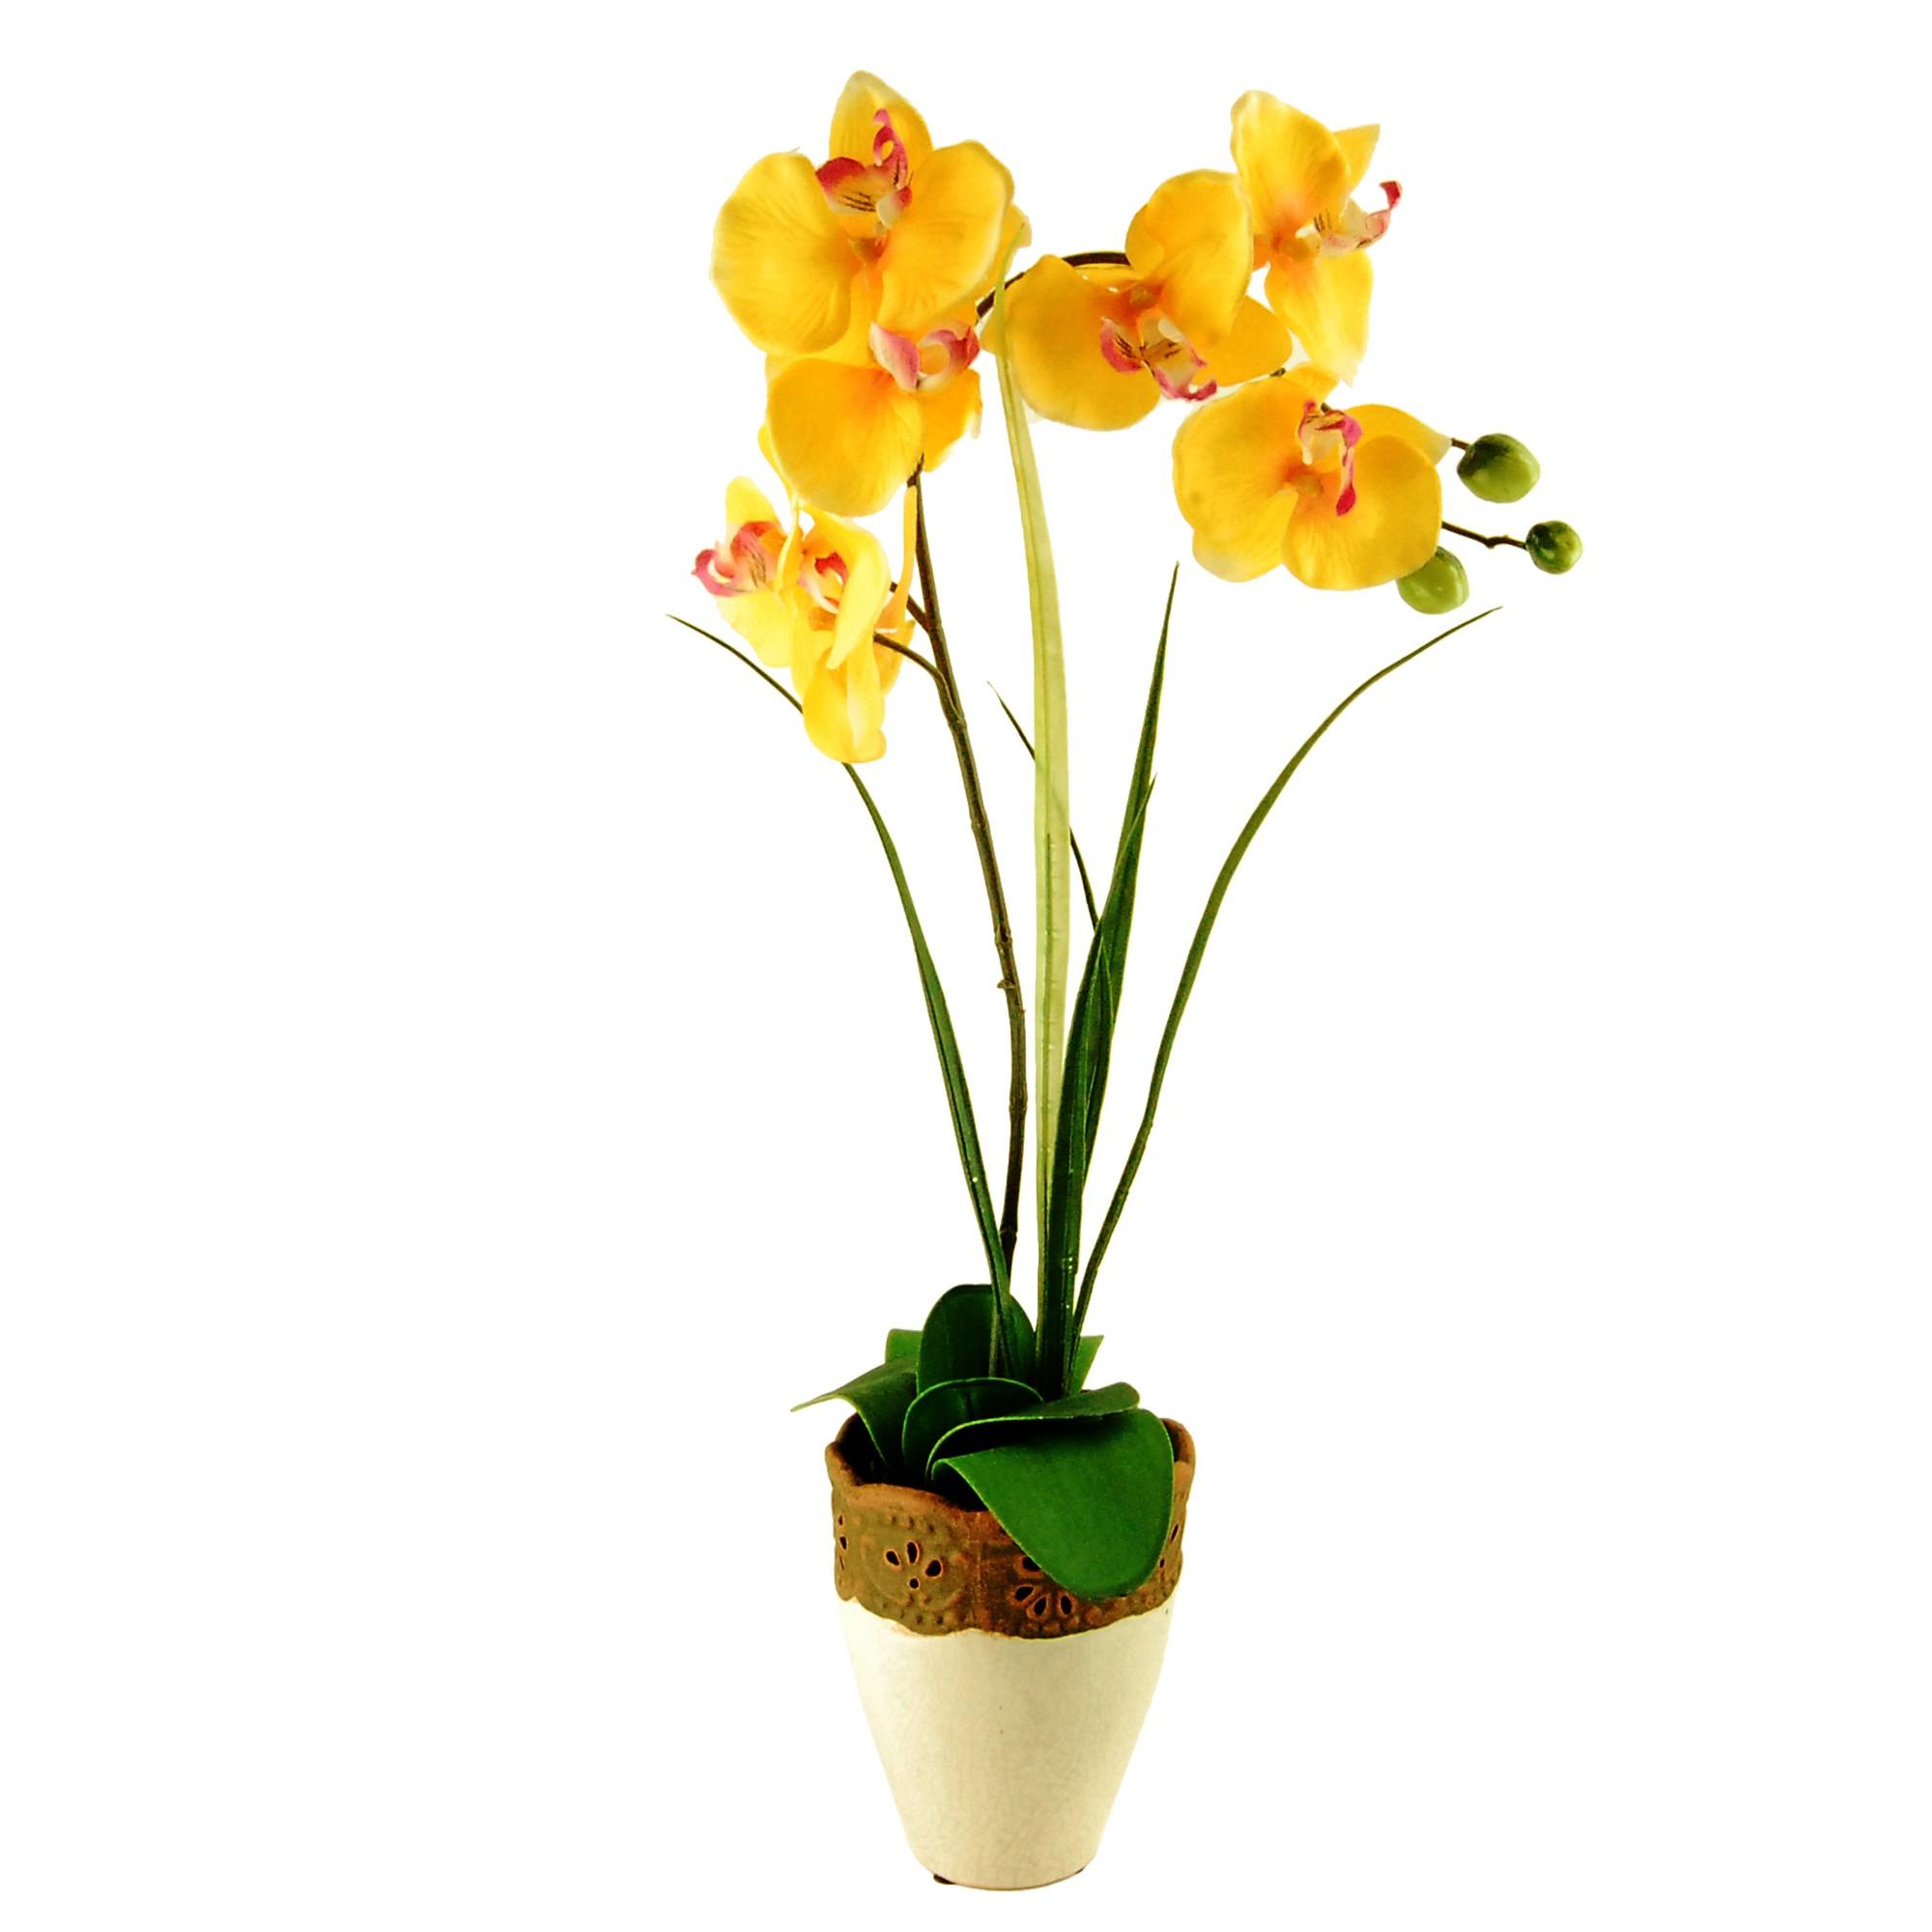 White LCG Florals Orchid Silk Floral Arrangement with Embossed Ceramic Vase